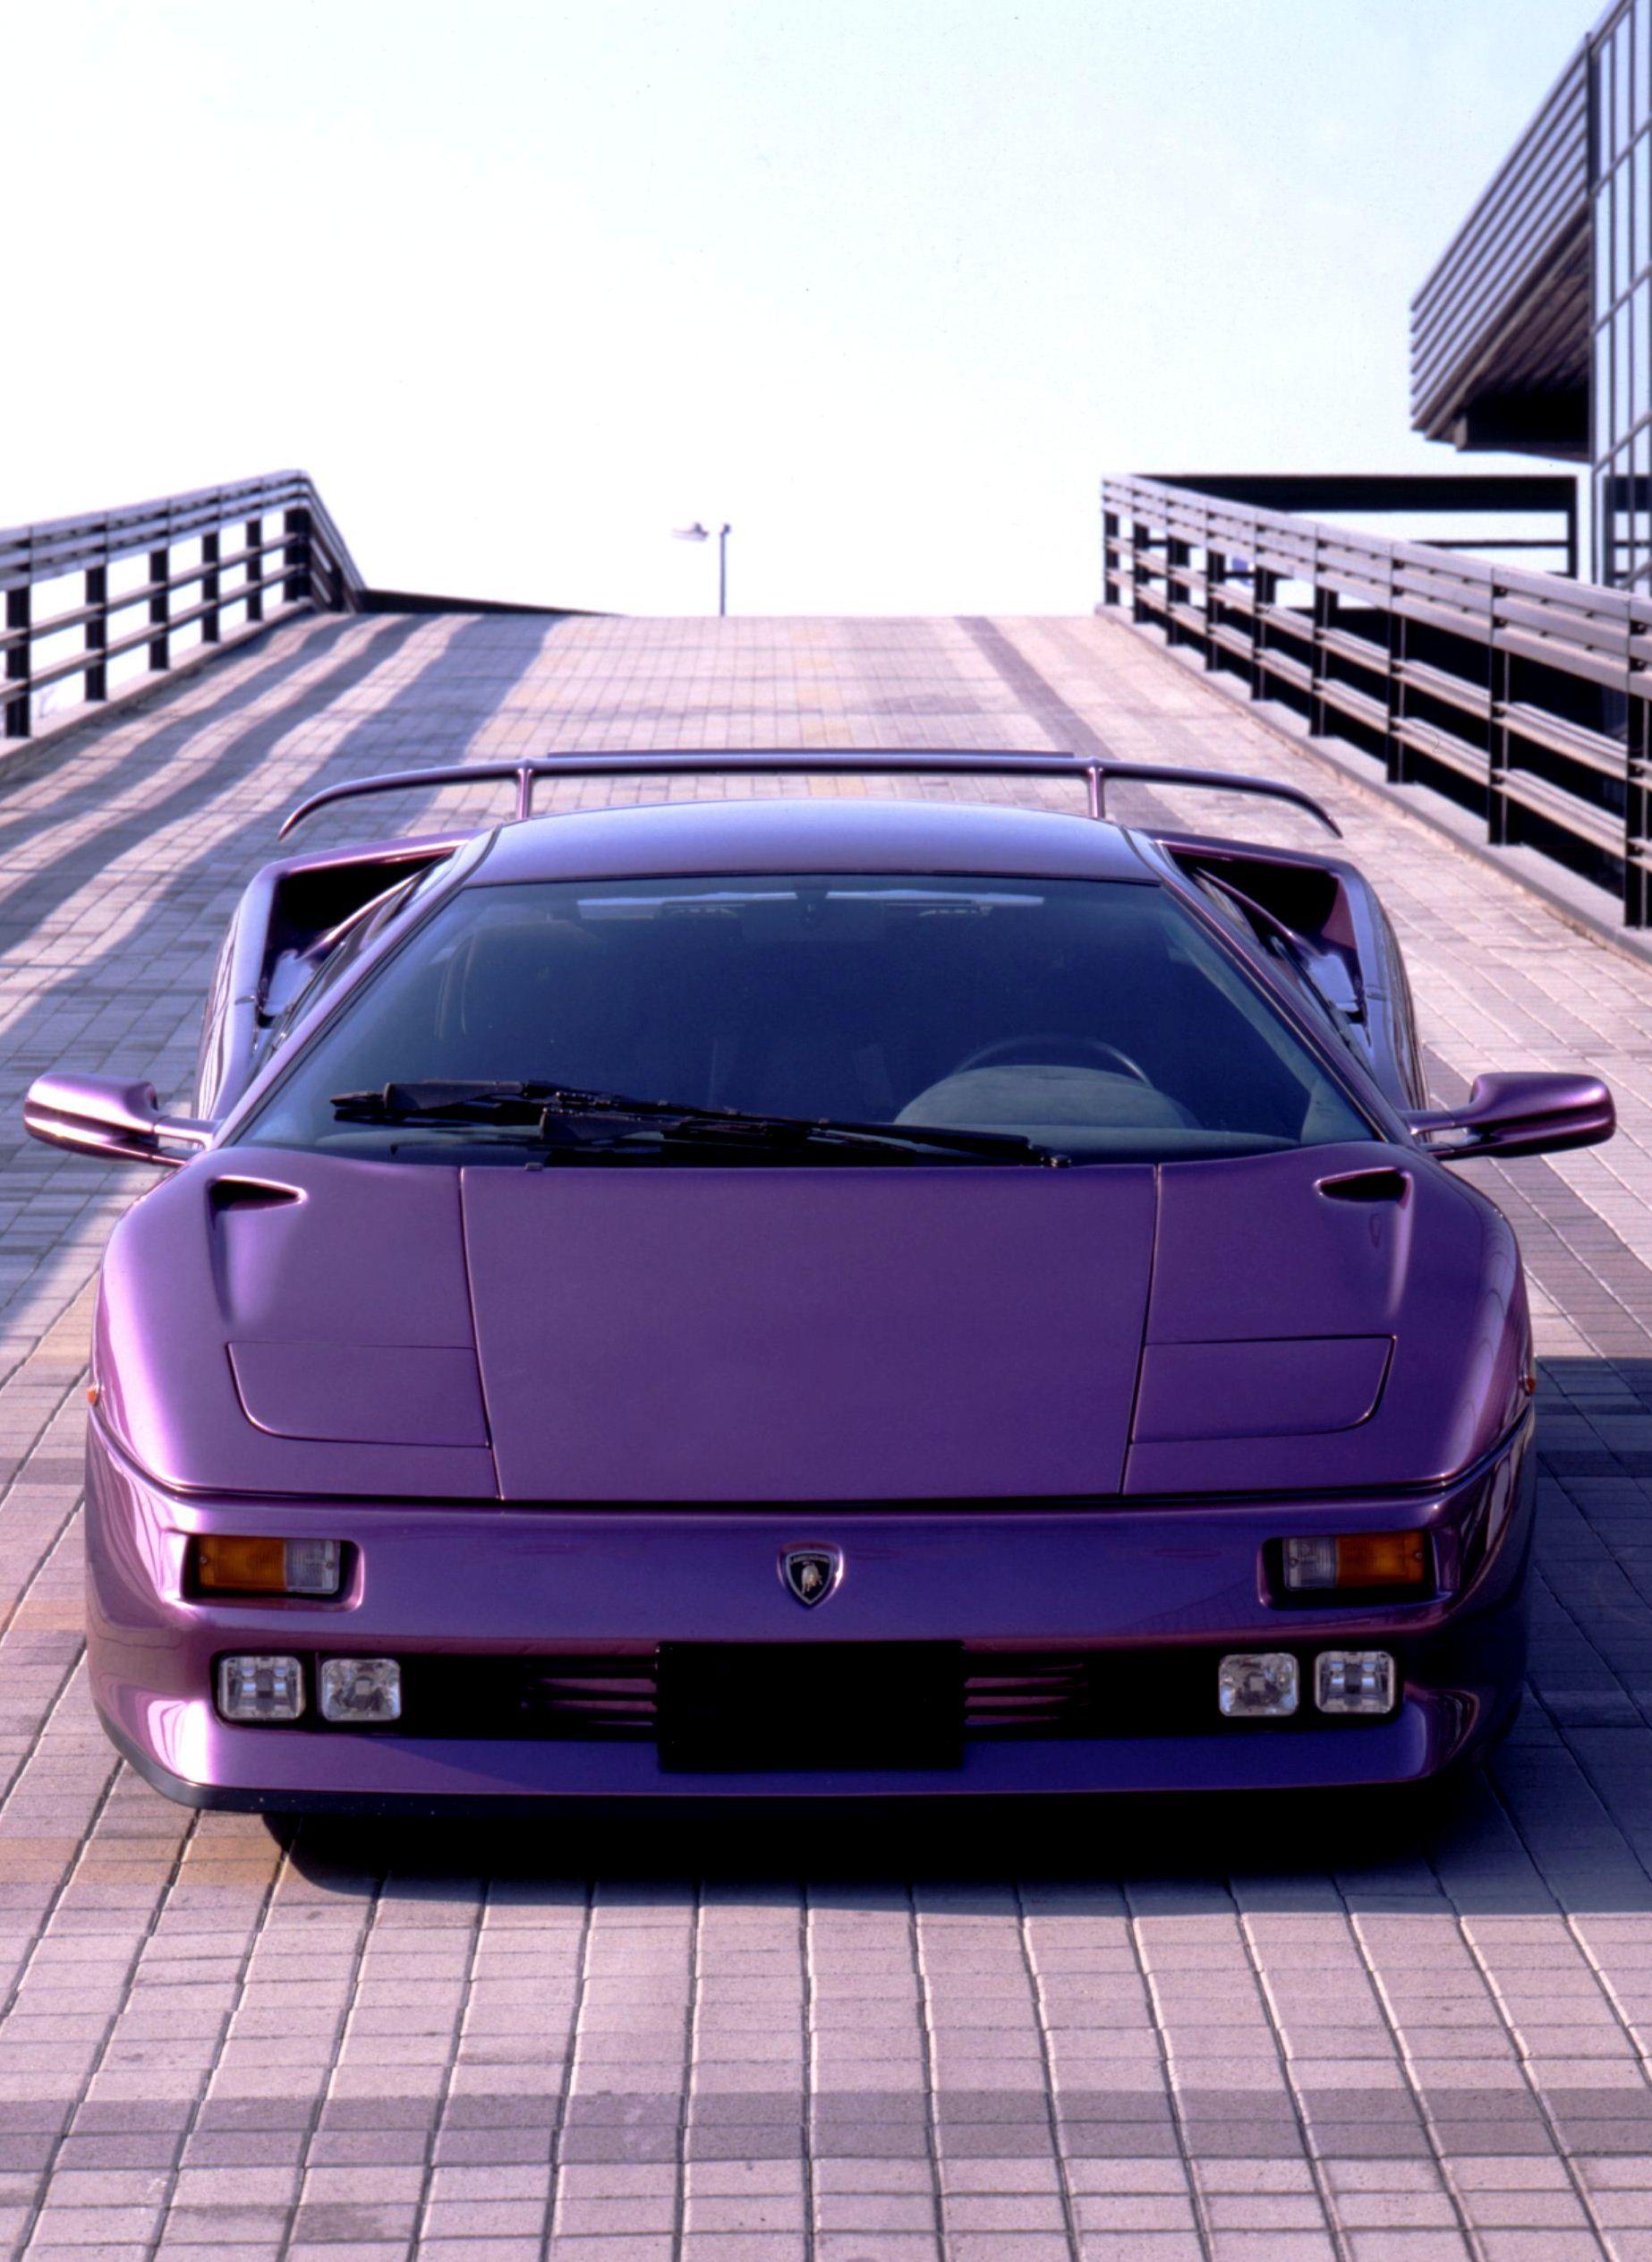 Lamborghini #Diablo | Cars | Pinterest | Lamborghini diablo ... on el diablo, purple mclaren p1, purple pagani zonda, purple saleen s7, purple ferrari, purple audi tt, purple fiat 500, purple mitsubishi eclipse, purple hennessey venom gt, lamborgini diablo, purple bmw m3, purple laferrari, purple rolls royce, purple roadster, purple porsche 911, purple toyota corolla, purple lotus elise, purple volkswagen beetle, purple pagani huayra, purple nissan gt-r,